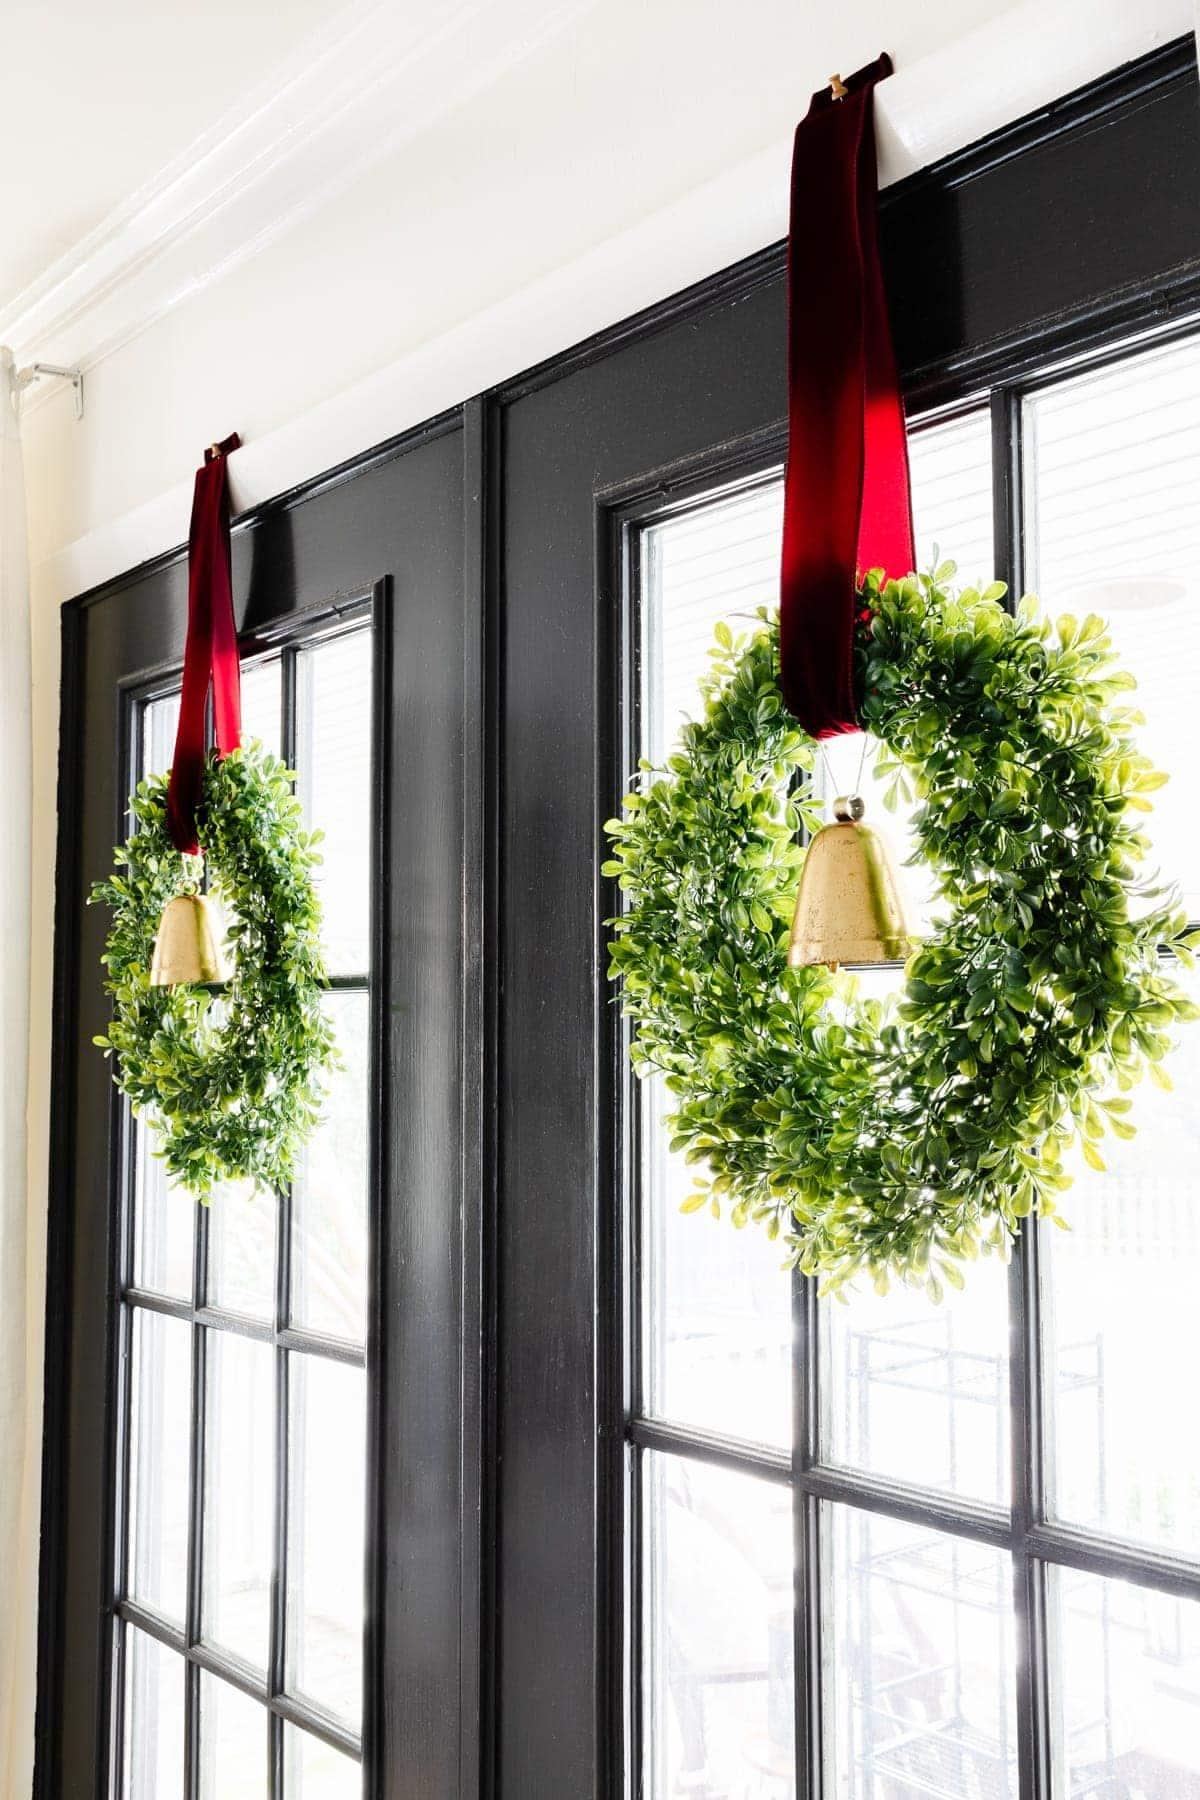 Hanging wreaths on windows